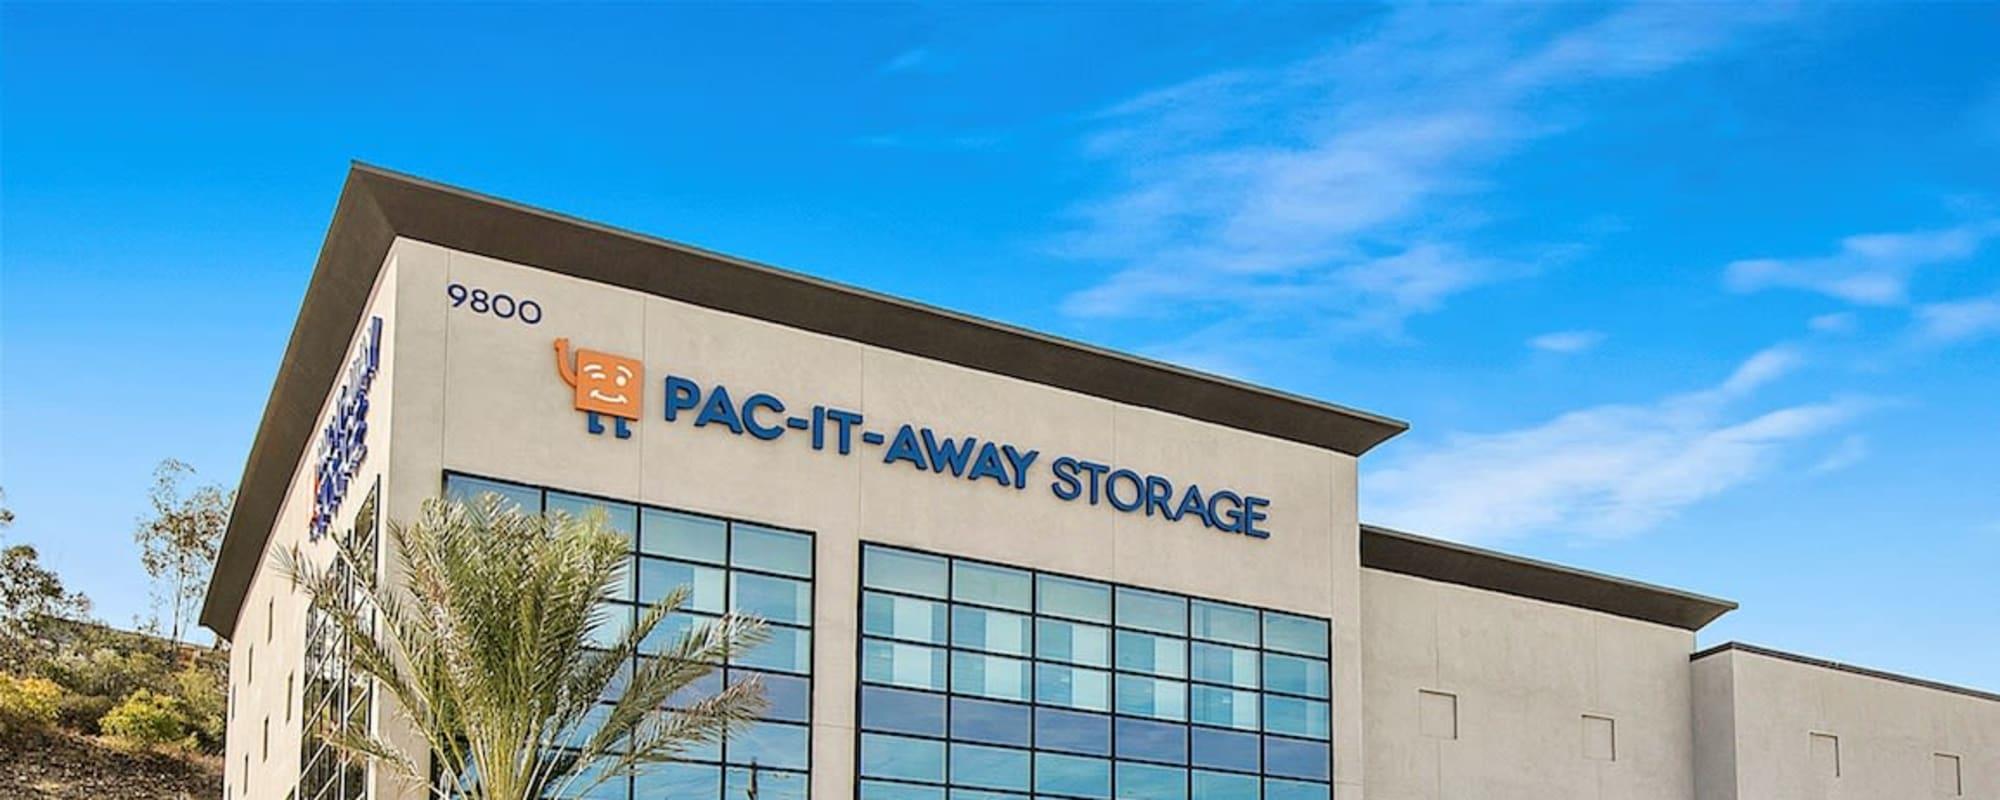 Pac-It-Away Storage in San Diego, California